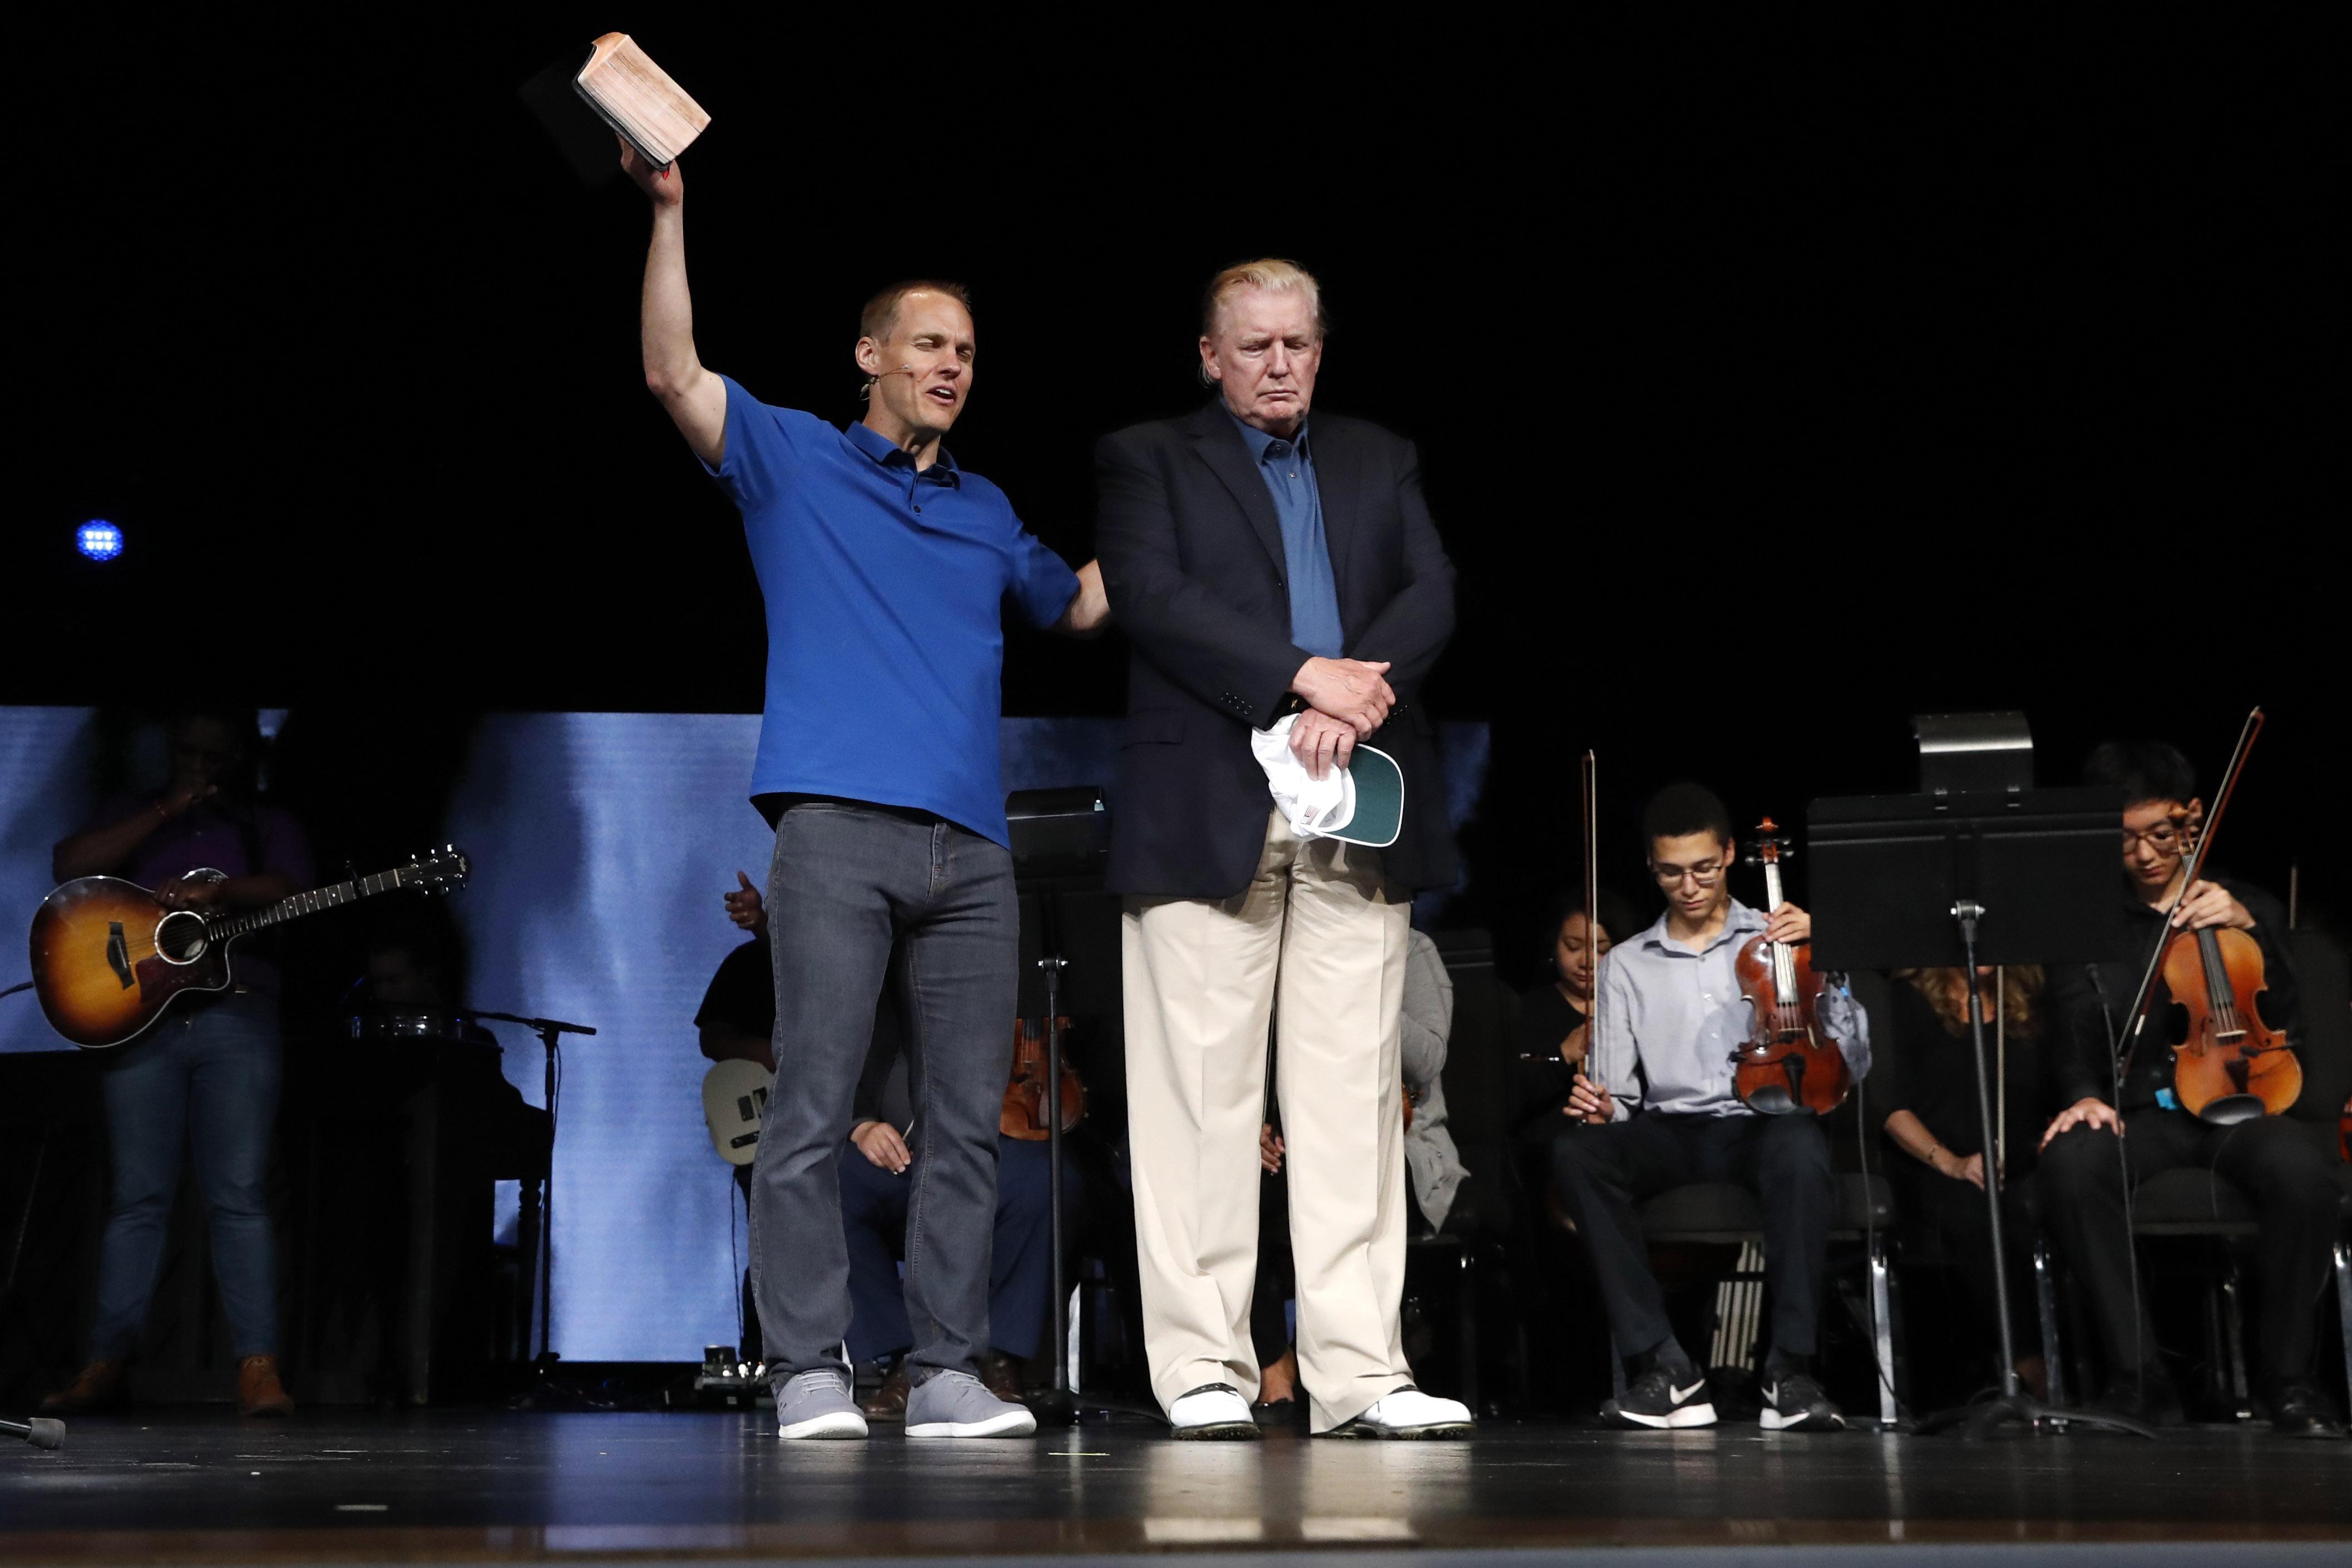 David Platt, McLean Bible Church pastor, apologizes for